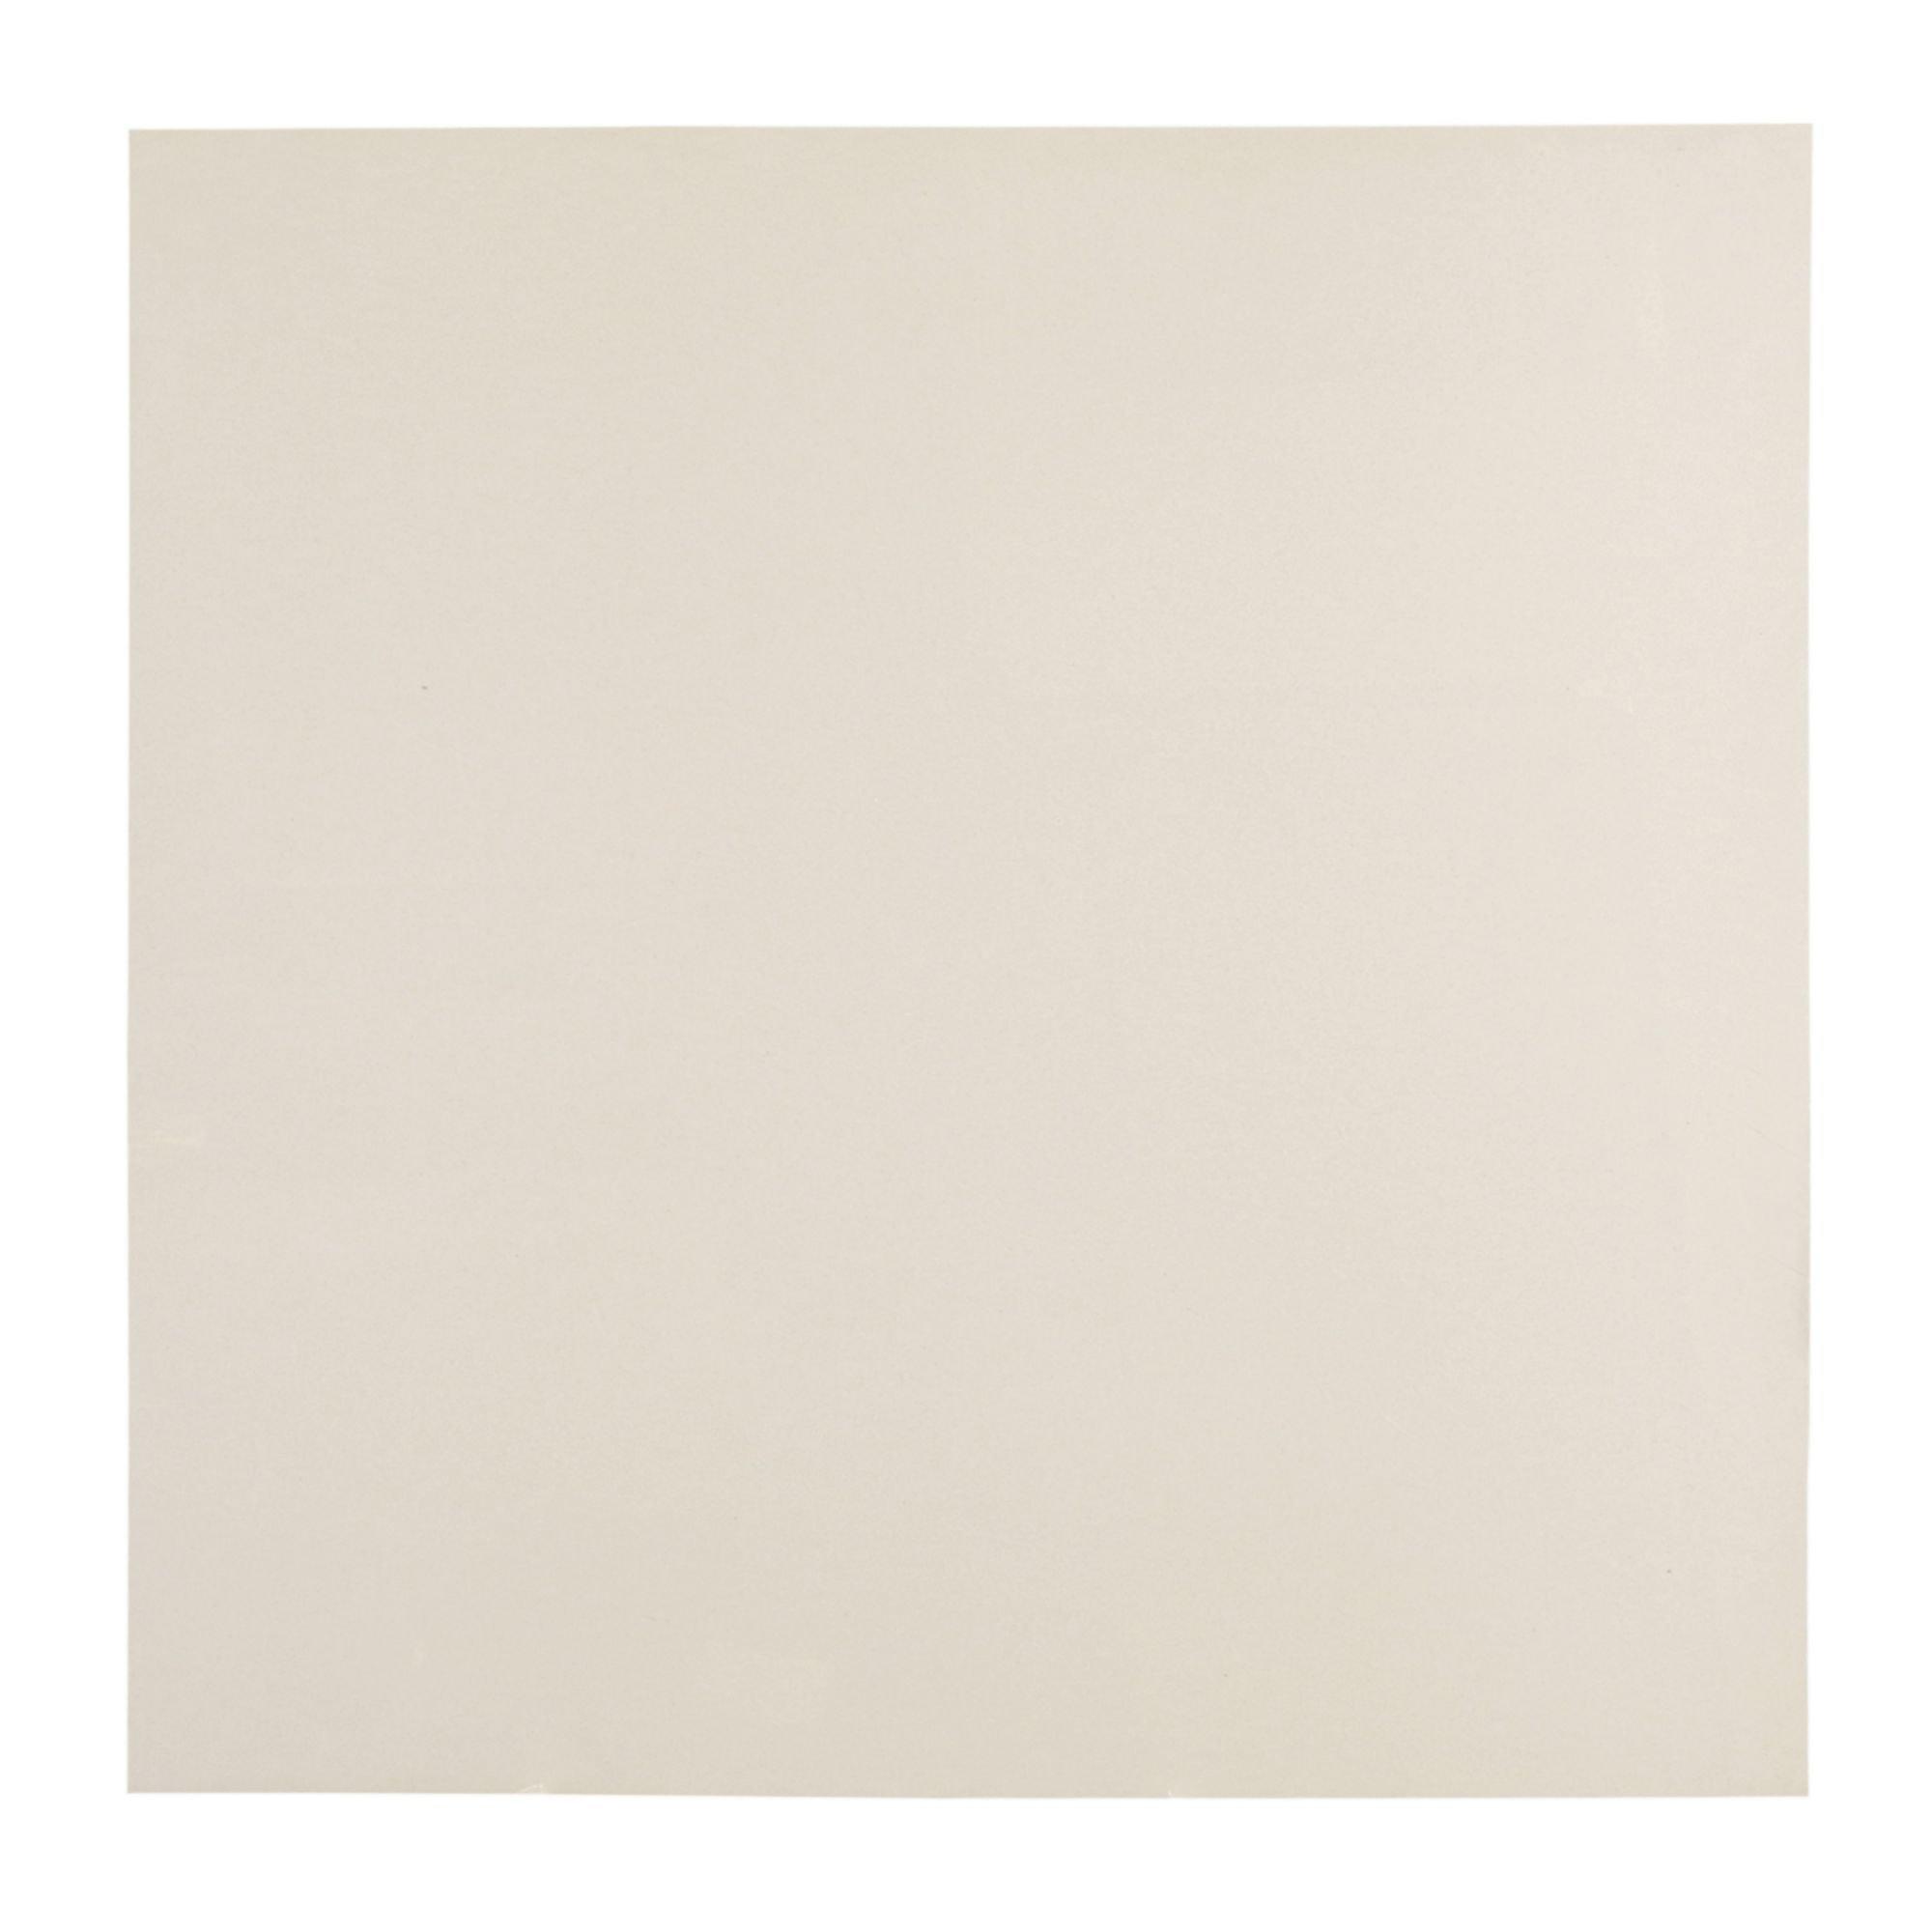 Gresie Interior 60 X 60 Cm Plain Ivory Rectificata